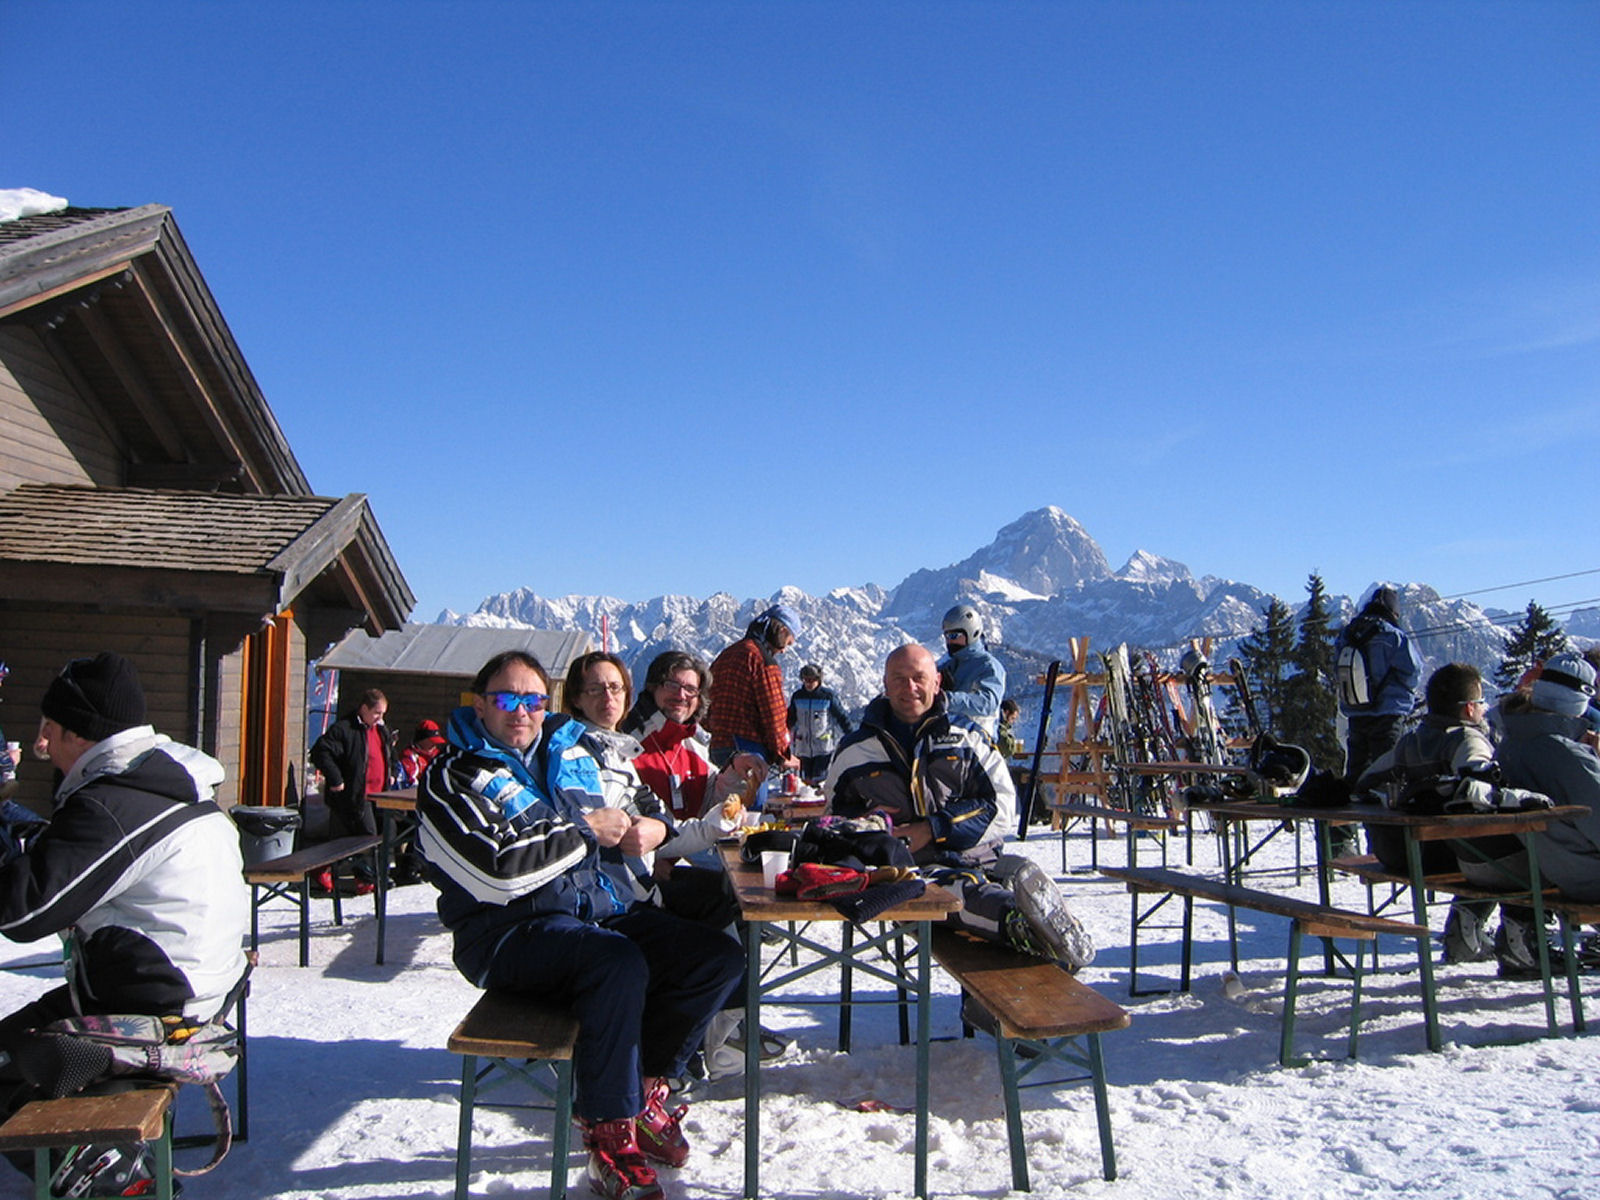 Mount Lussari in winter, Tarvisio, province of Udine, region Friuli-Venezia Giulia, Italy